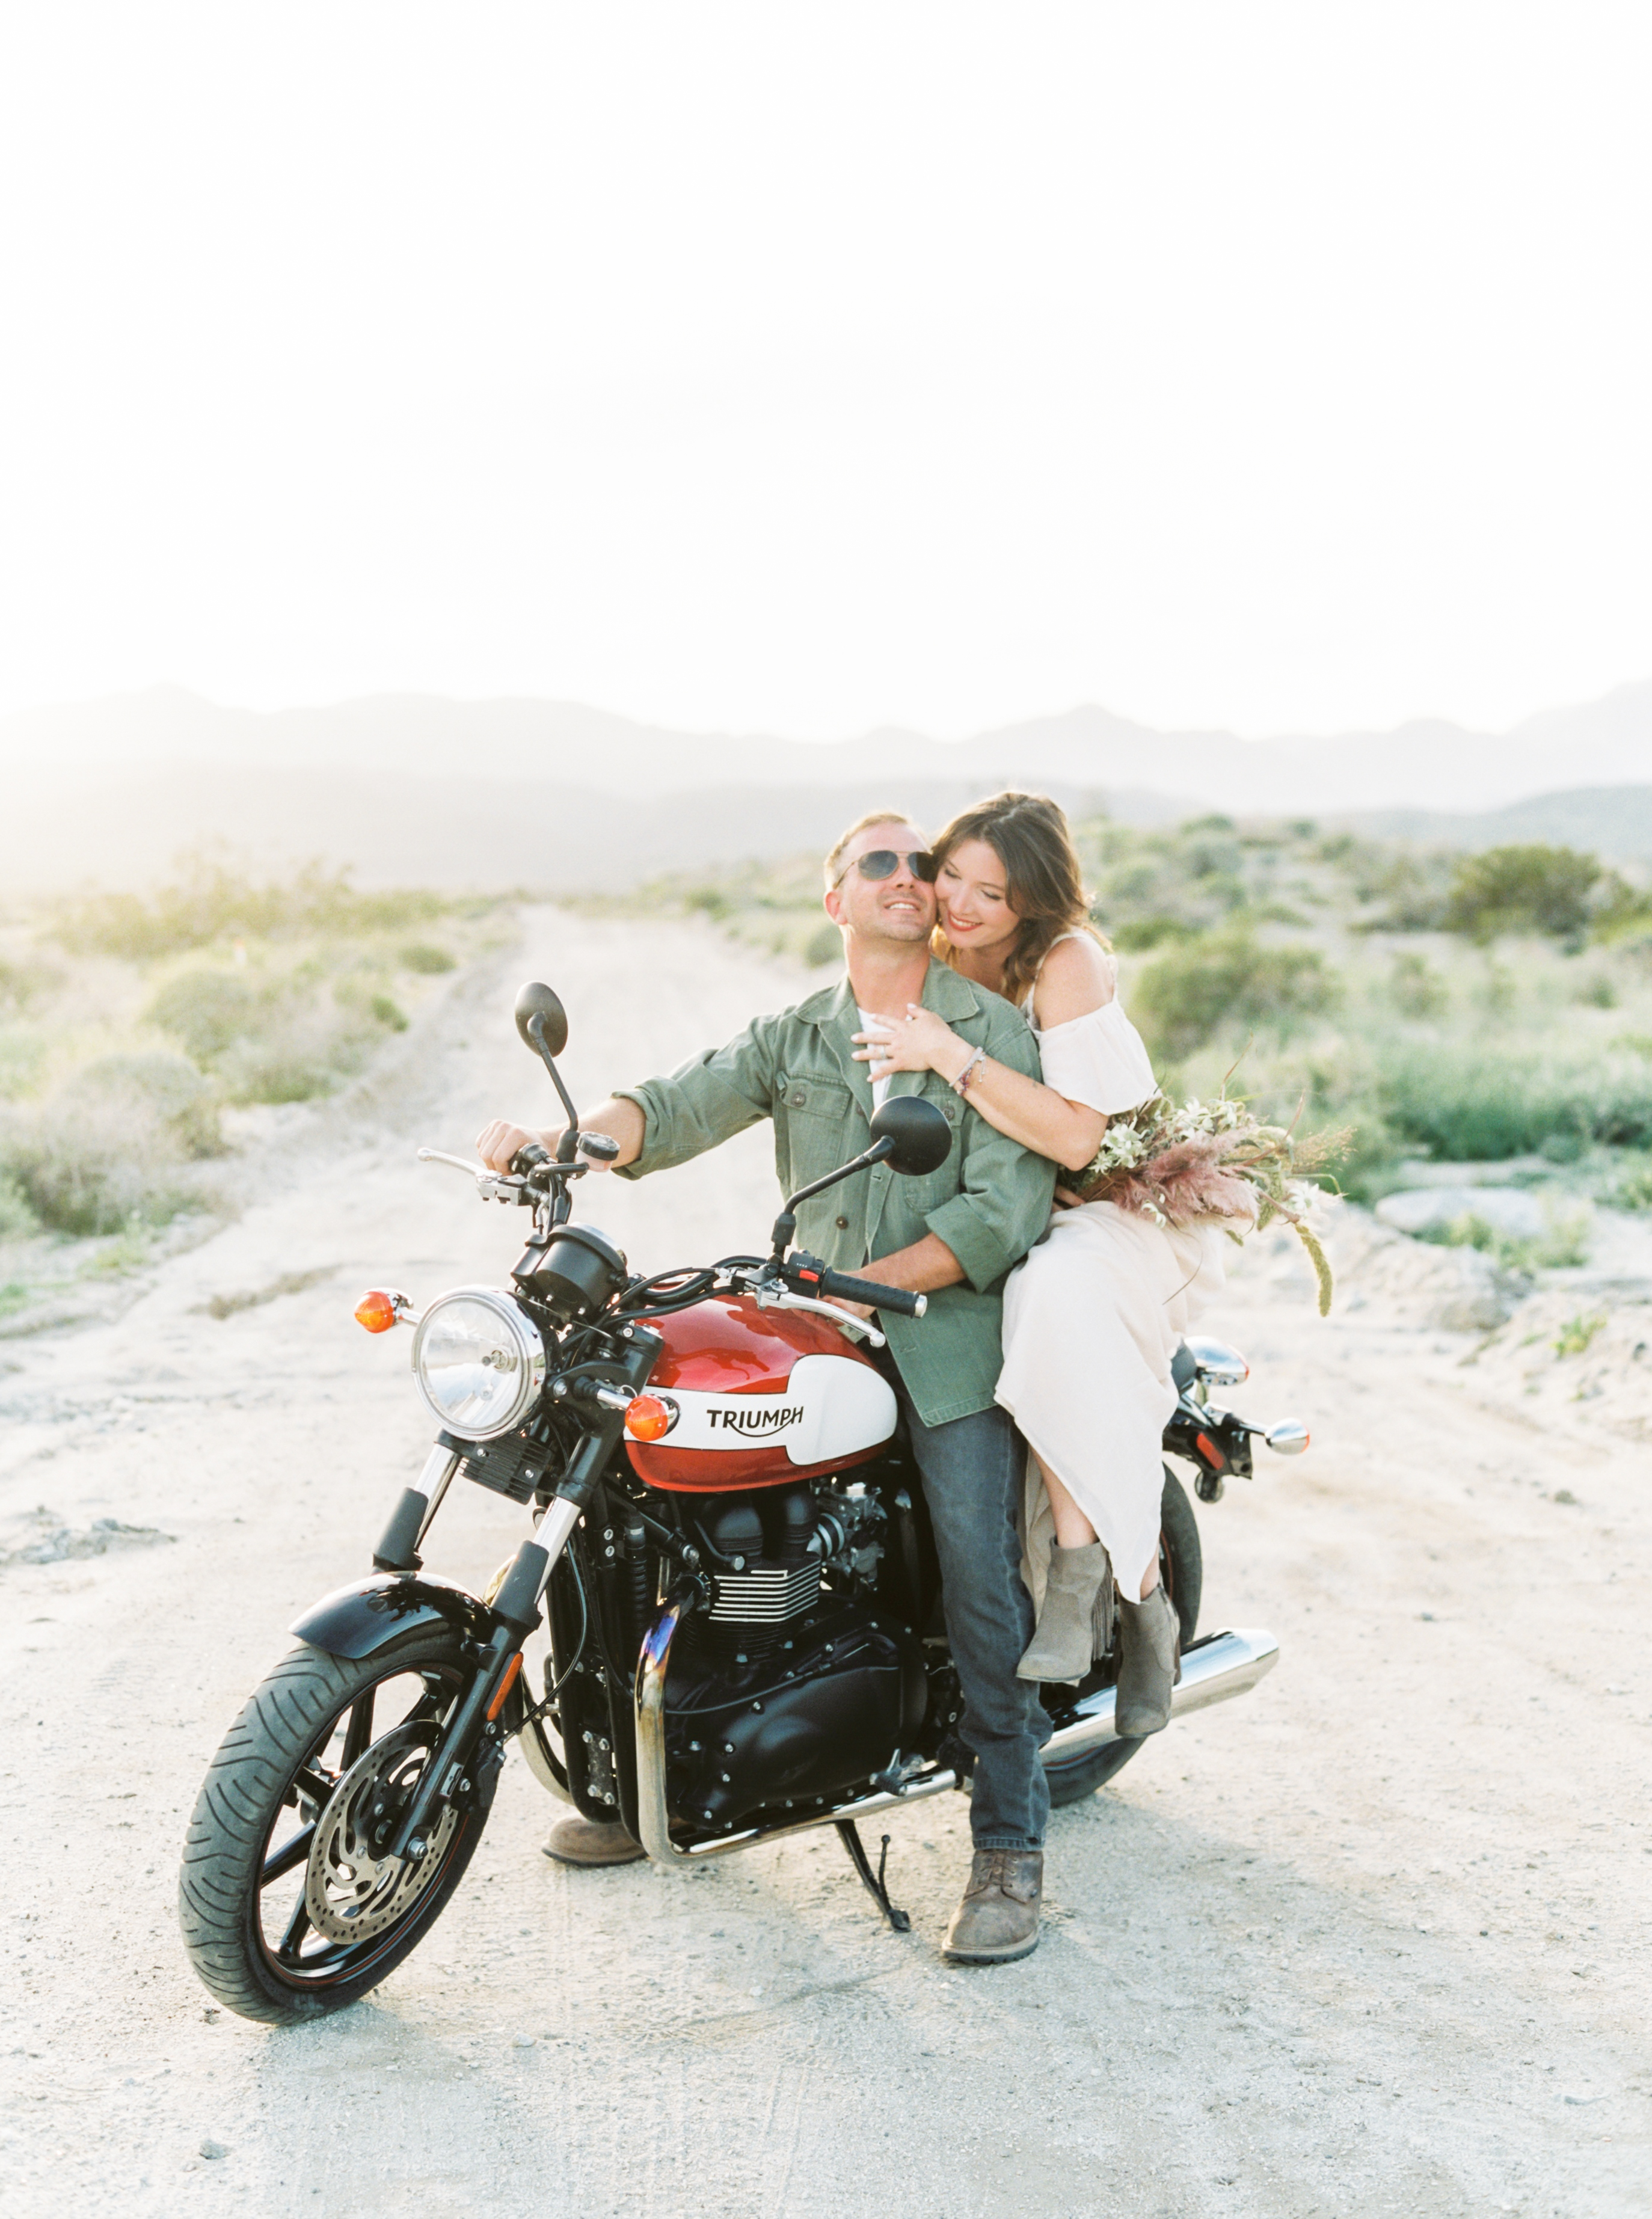 couple on motorcycle engagement photo